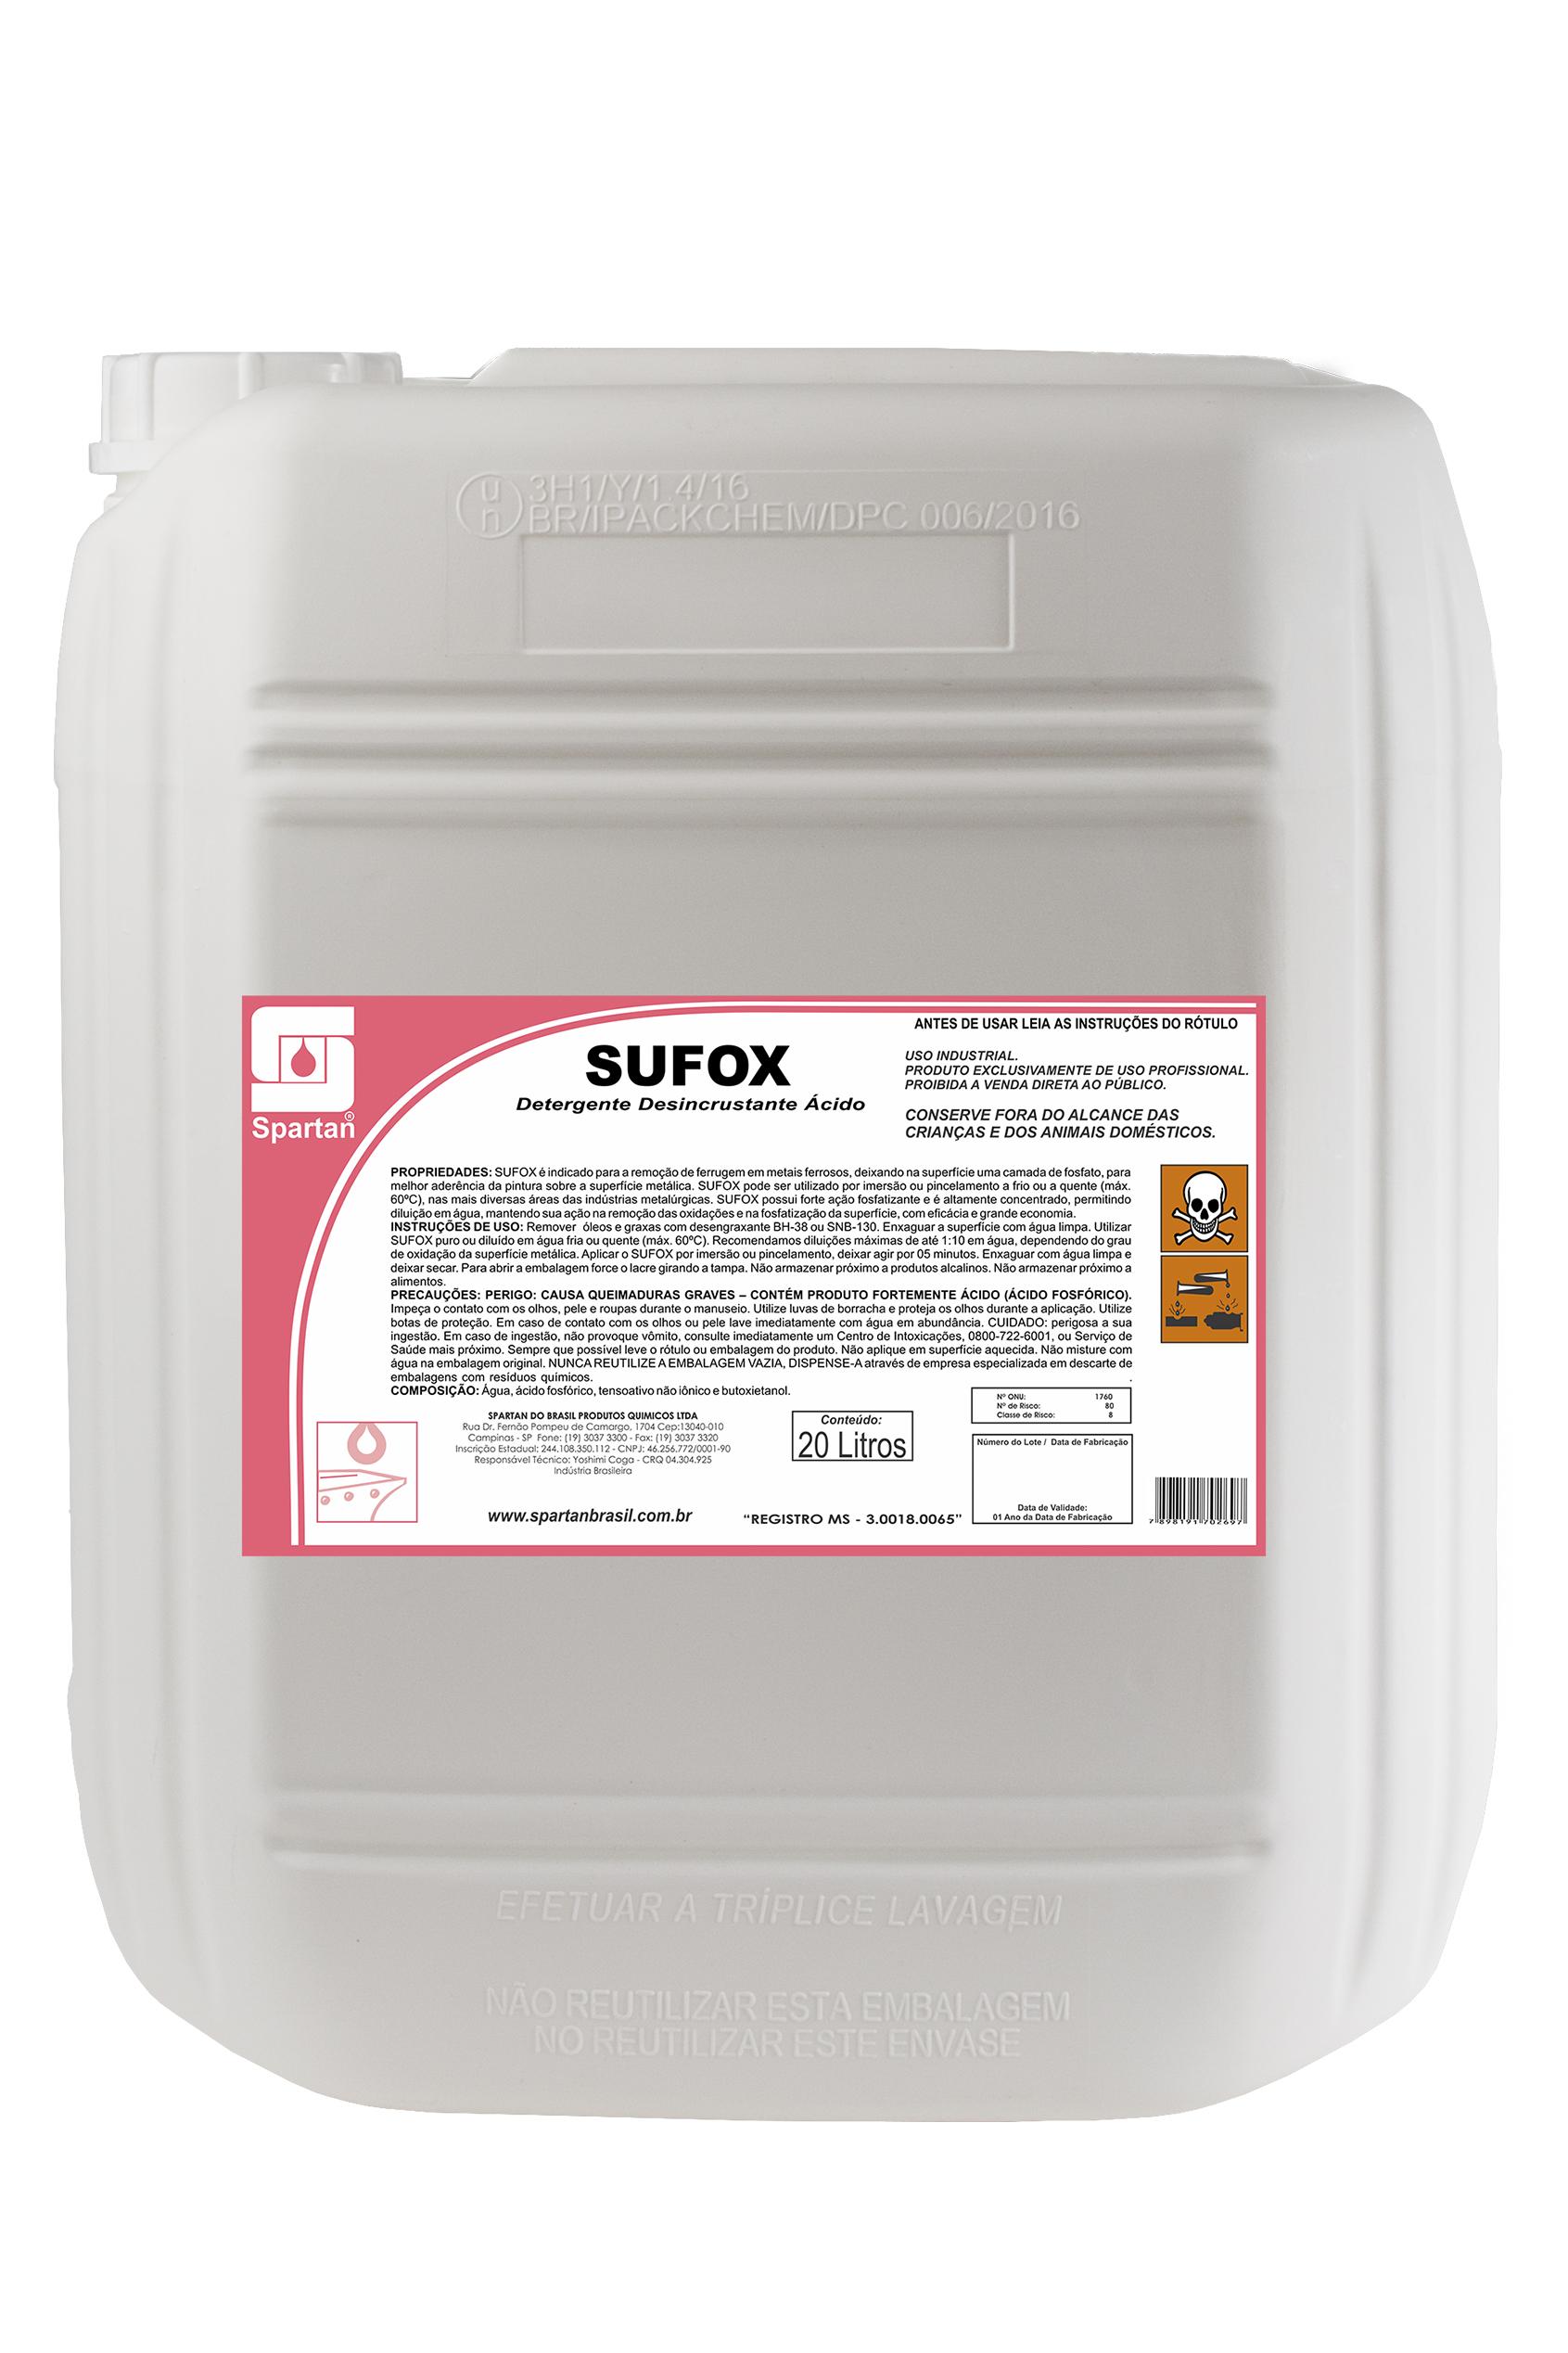 Sufox